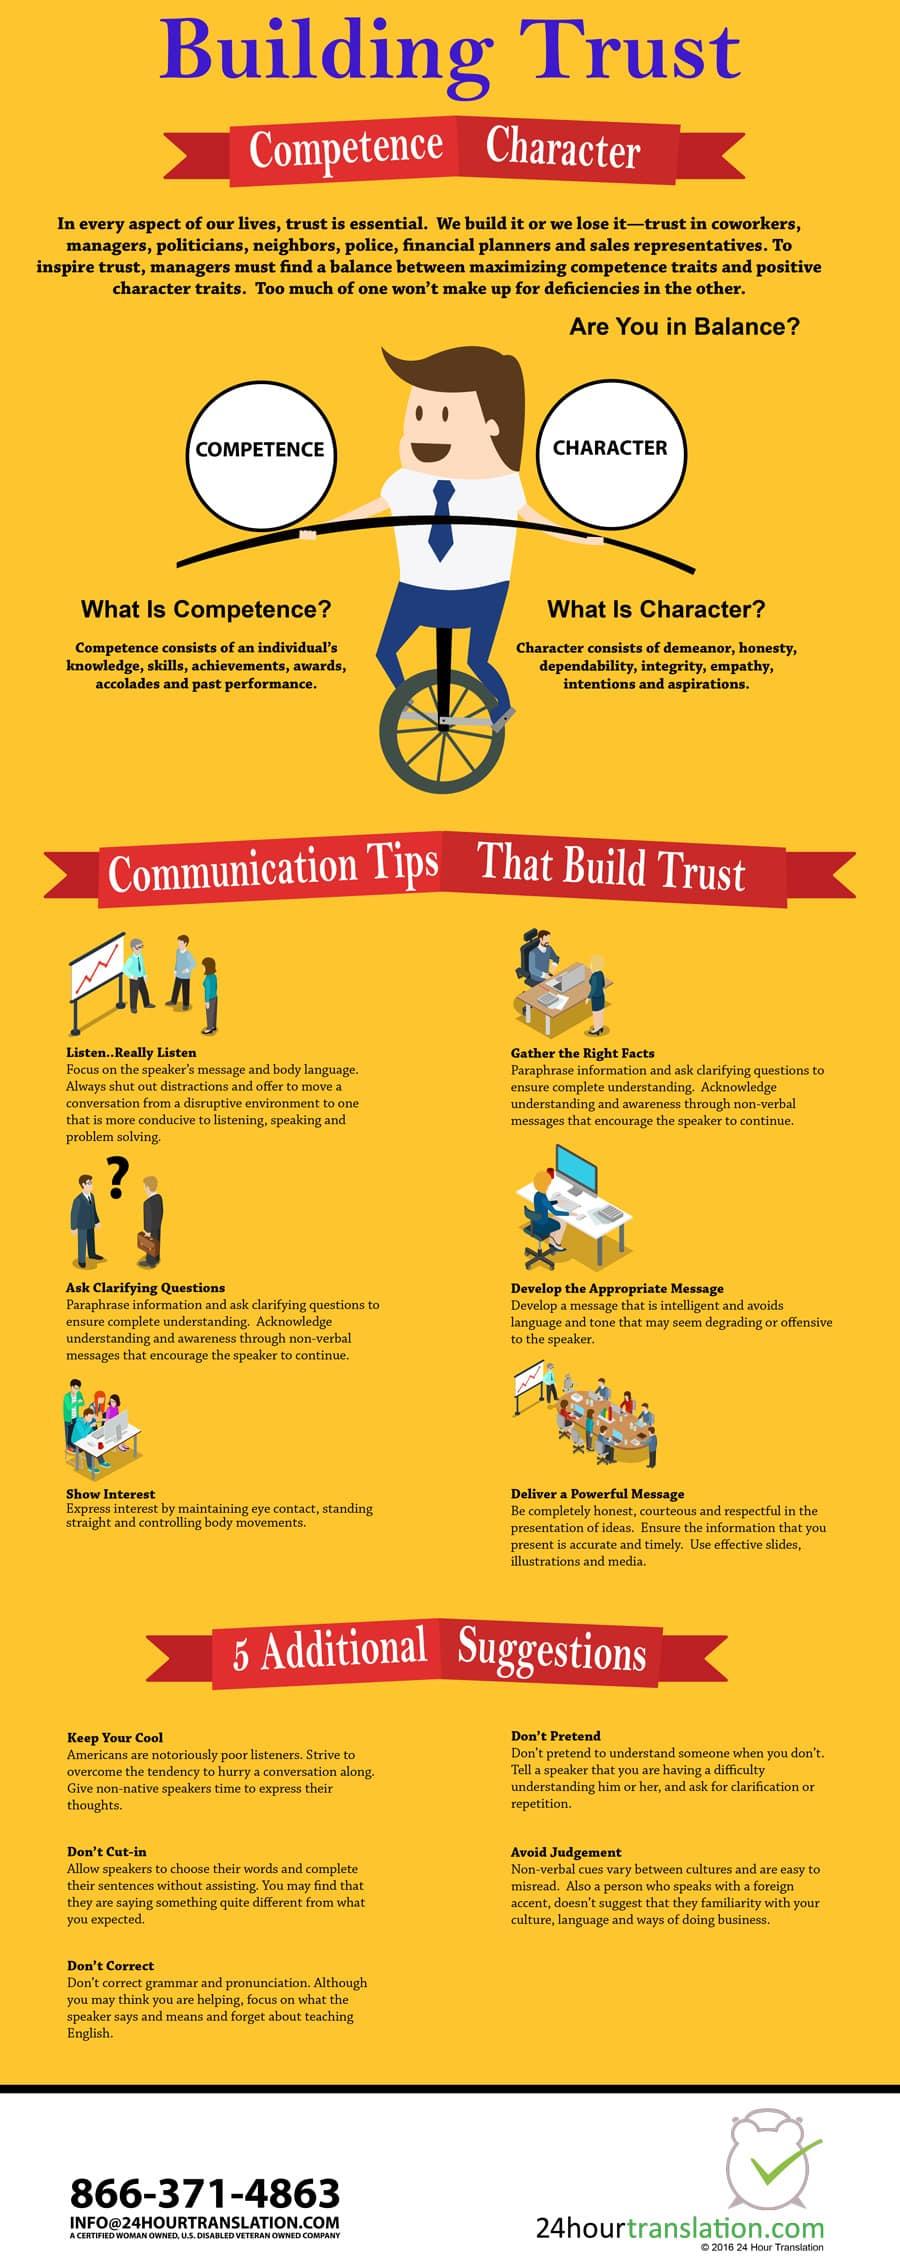 Listening to Build Trust